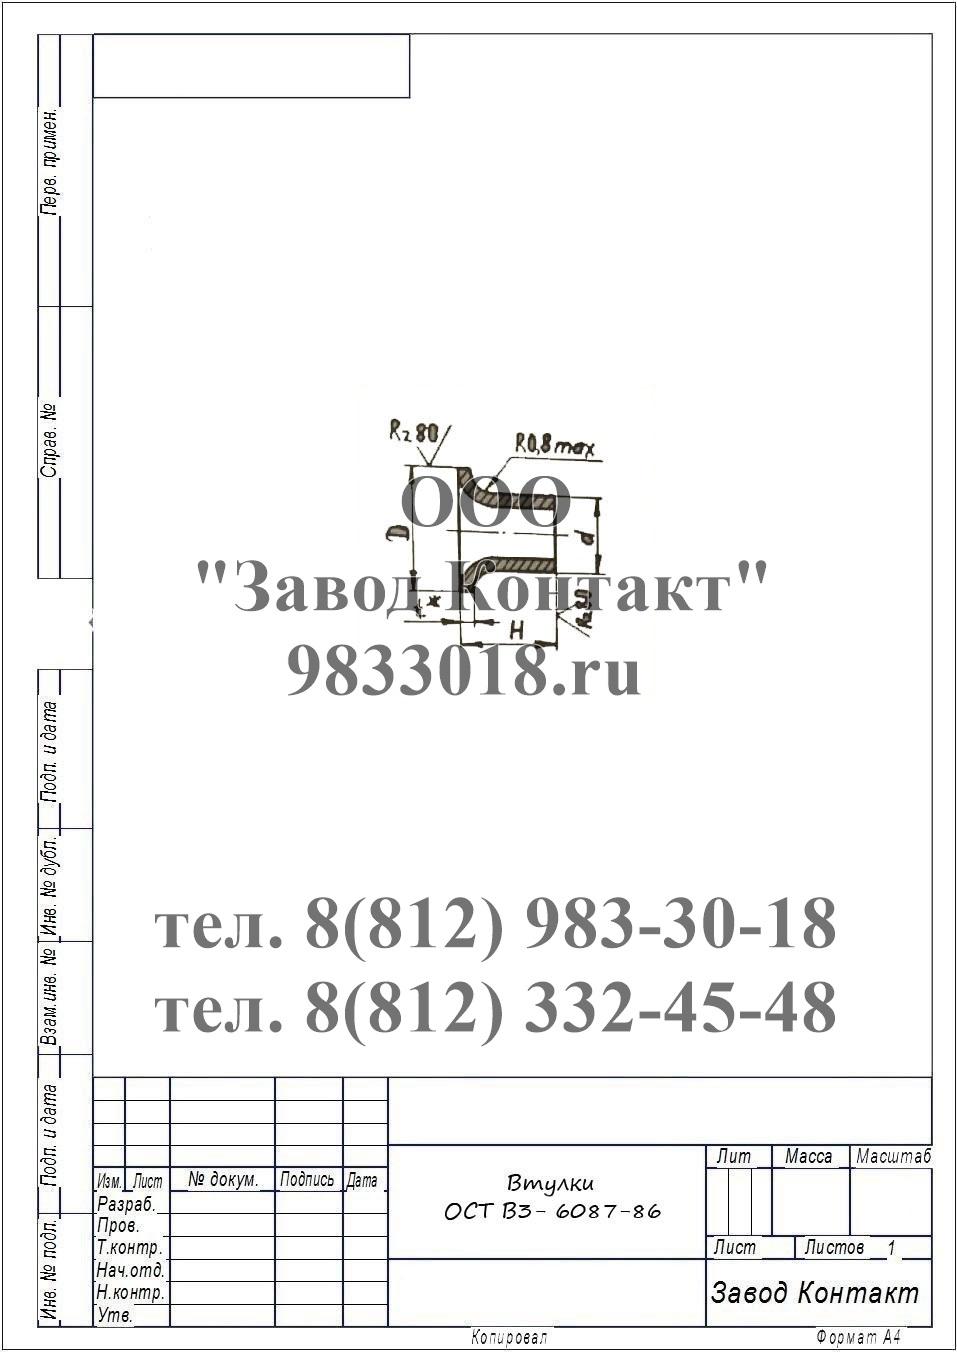 Снять коттедж в Листвянке на берегу Байкала аренда